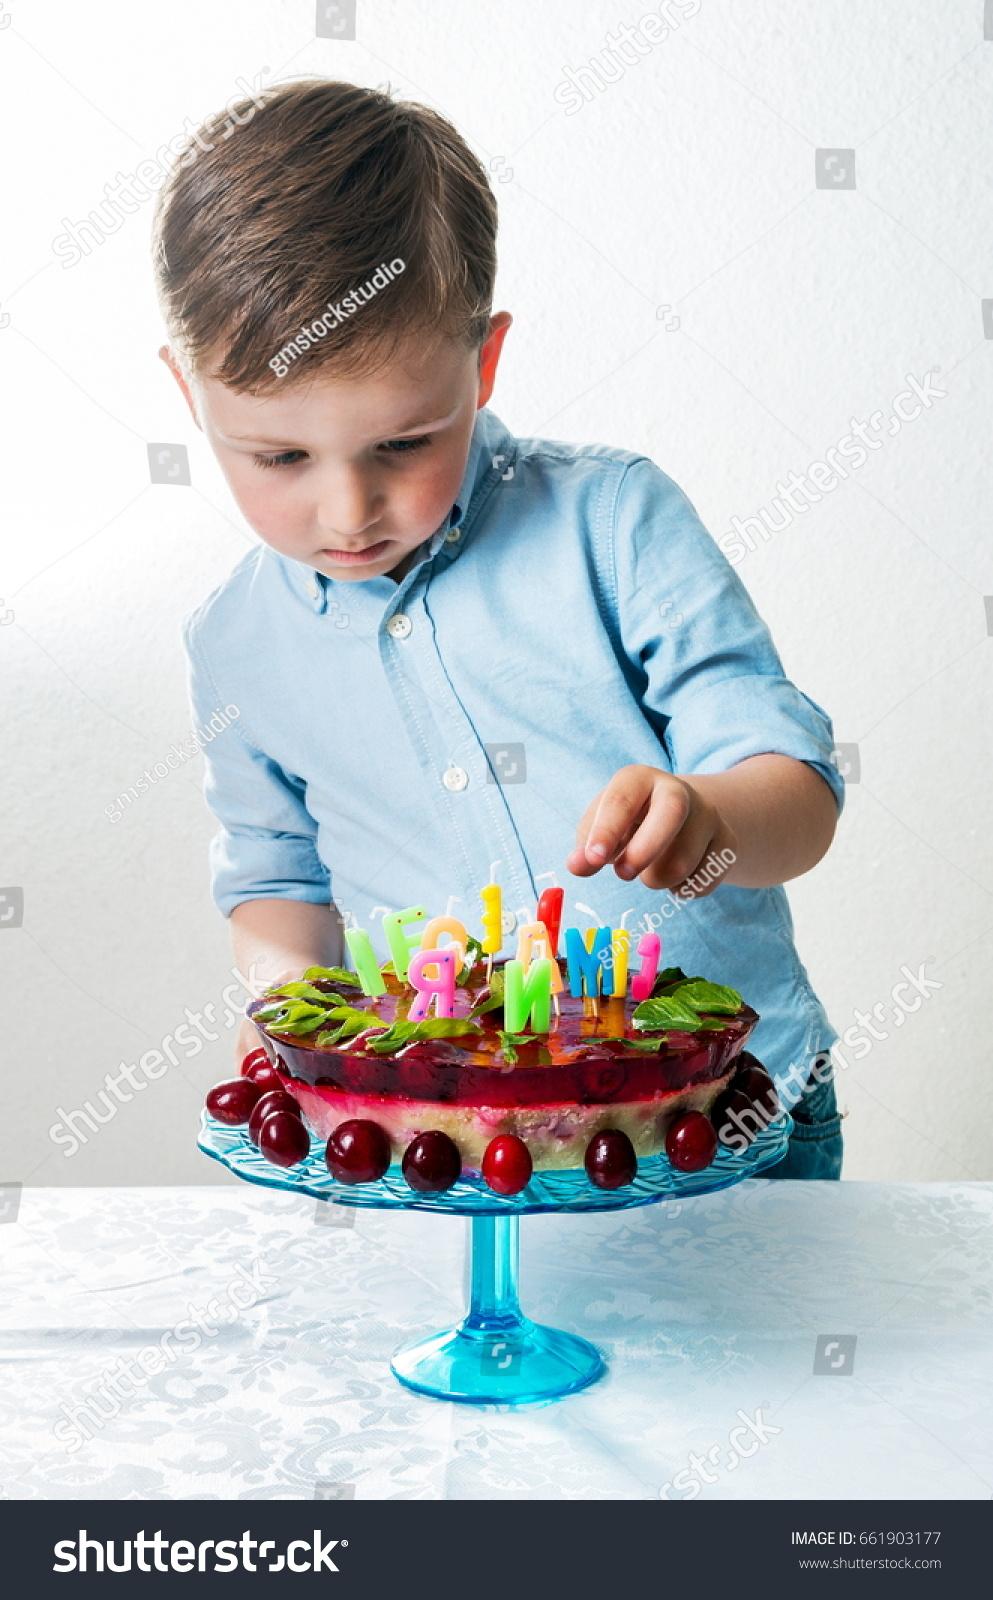 Miraculous Little Boy Birthday Cake Stock Photo Edit Now 661903177 Personalised Birthday Cards Veneteletsinfo